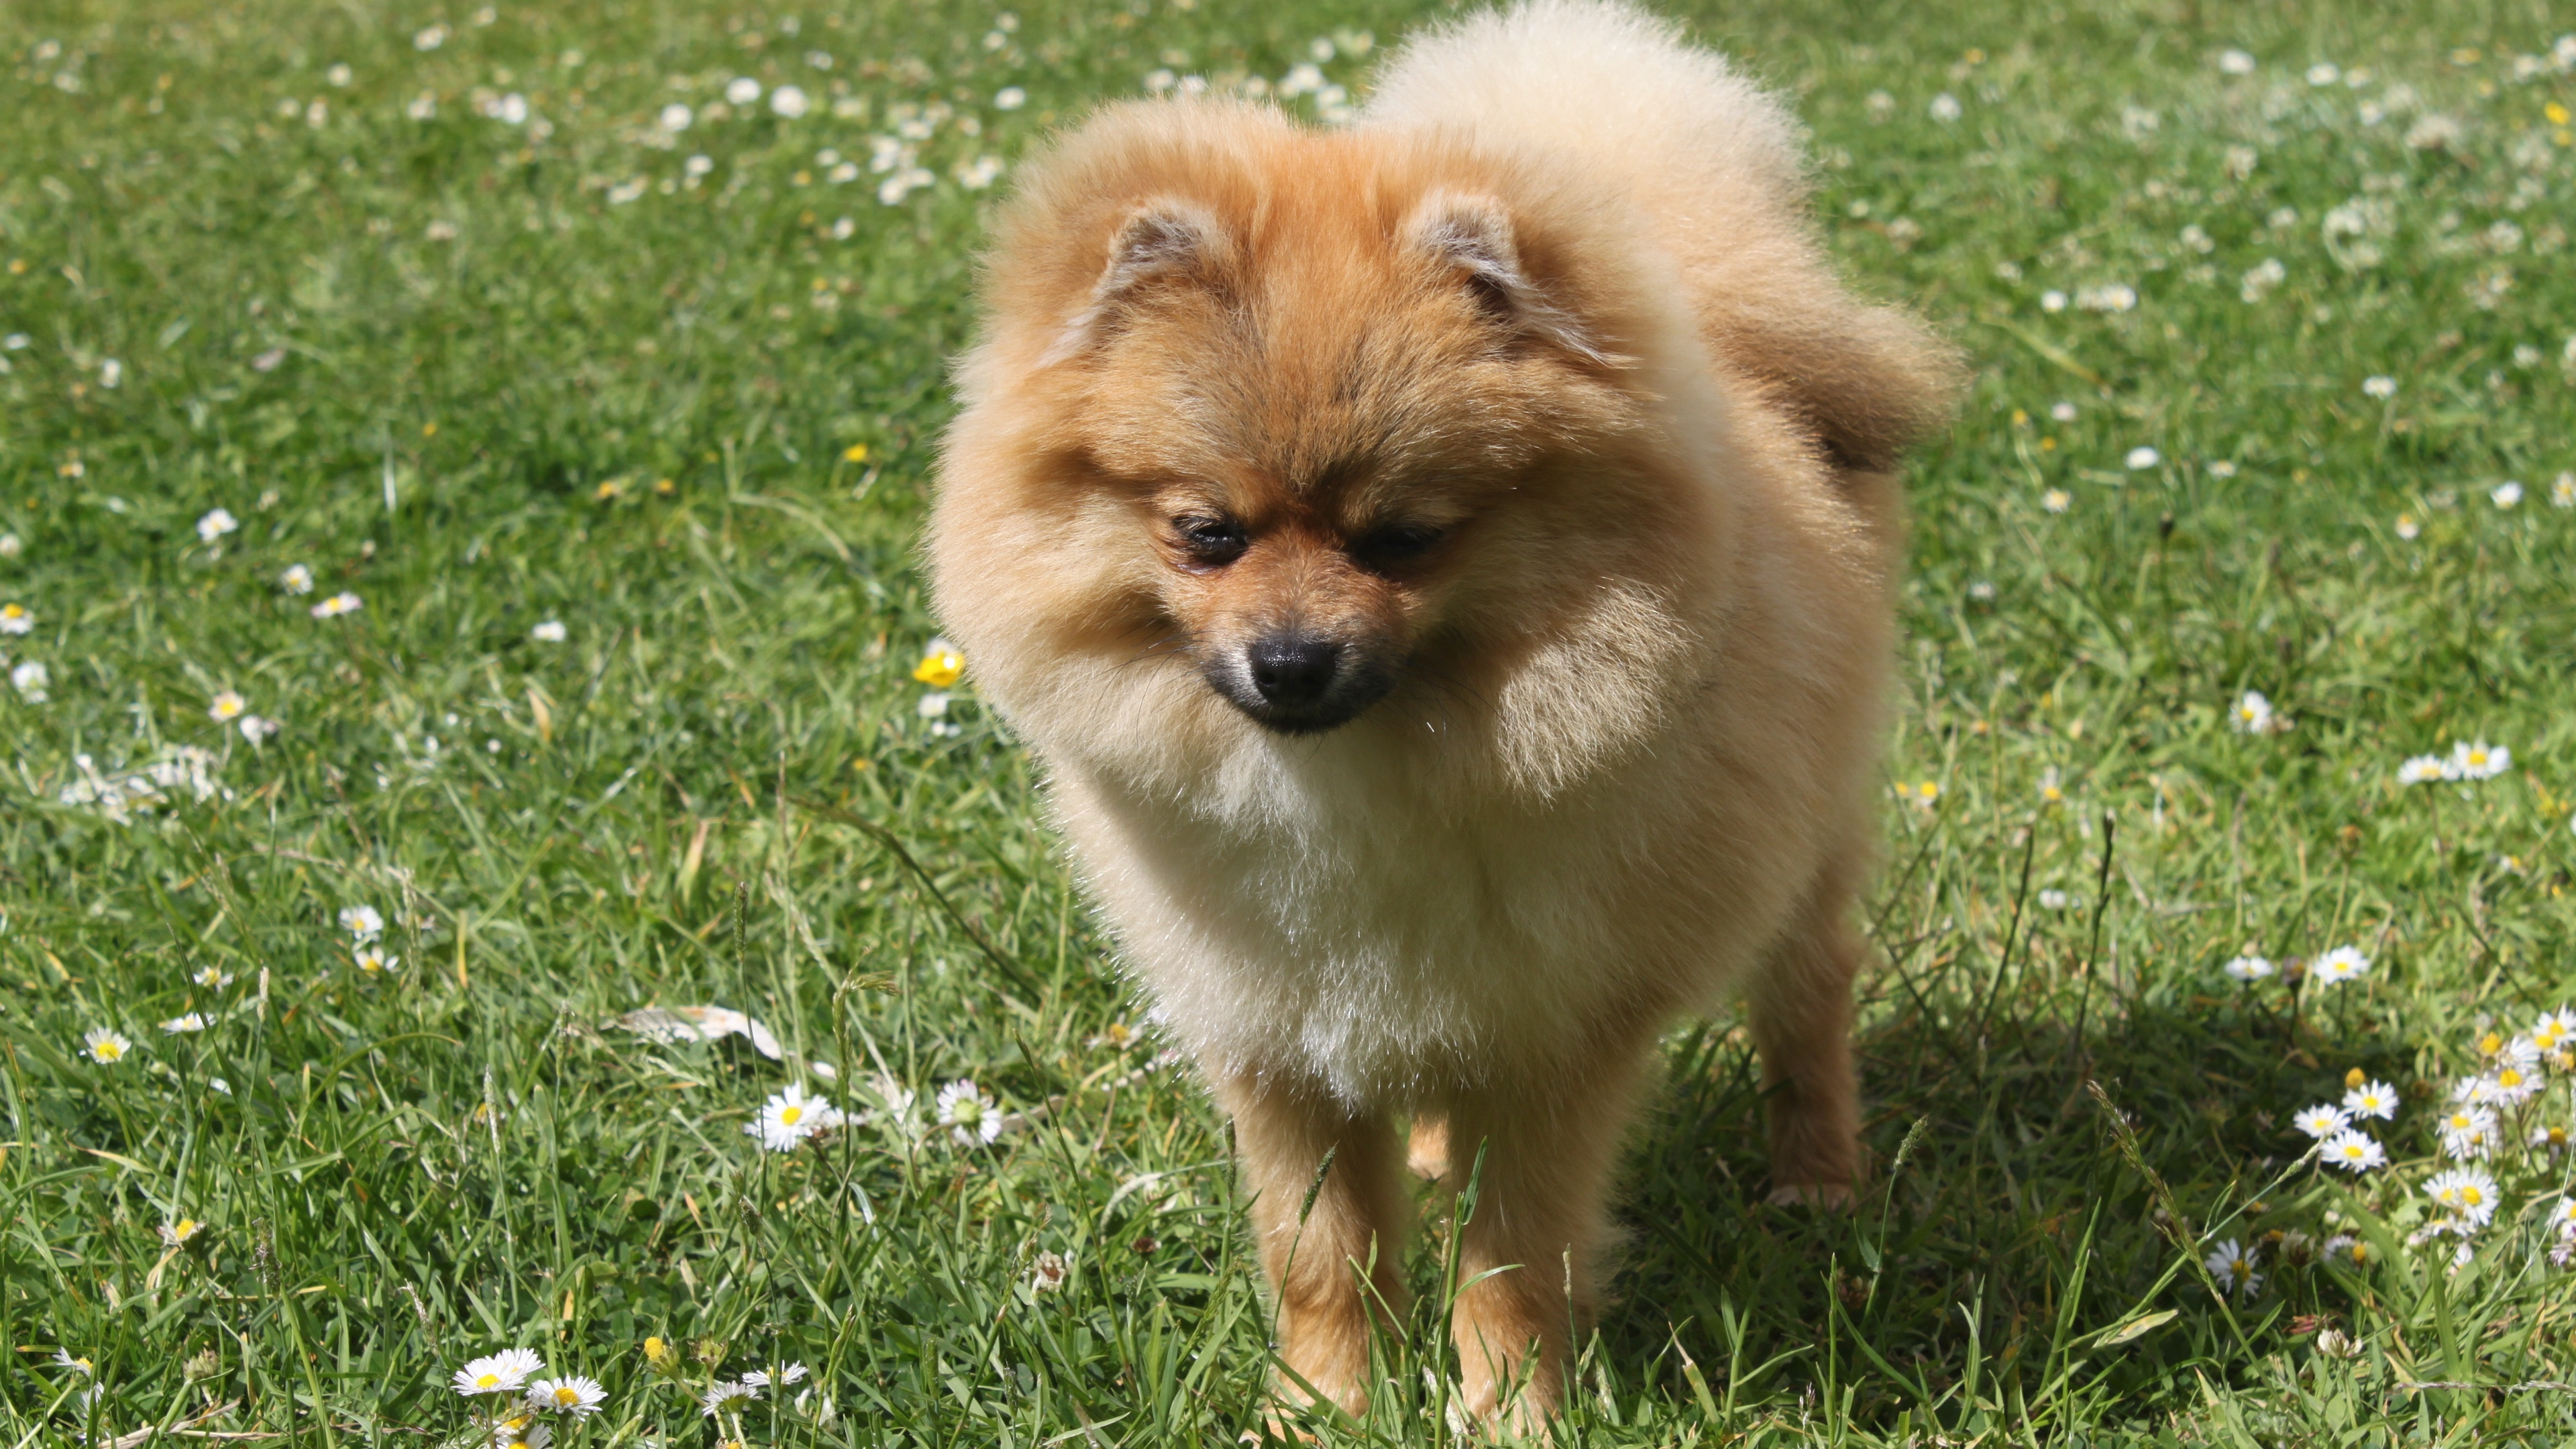 spitz dog miniature grass 4k 1542242662 - spitz, dog, miniature, grass 4k - spitz, miniature, Dog